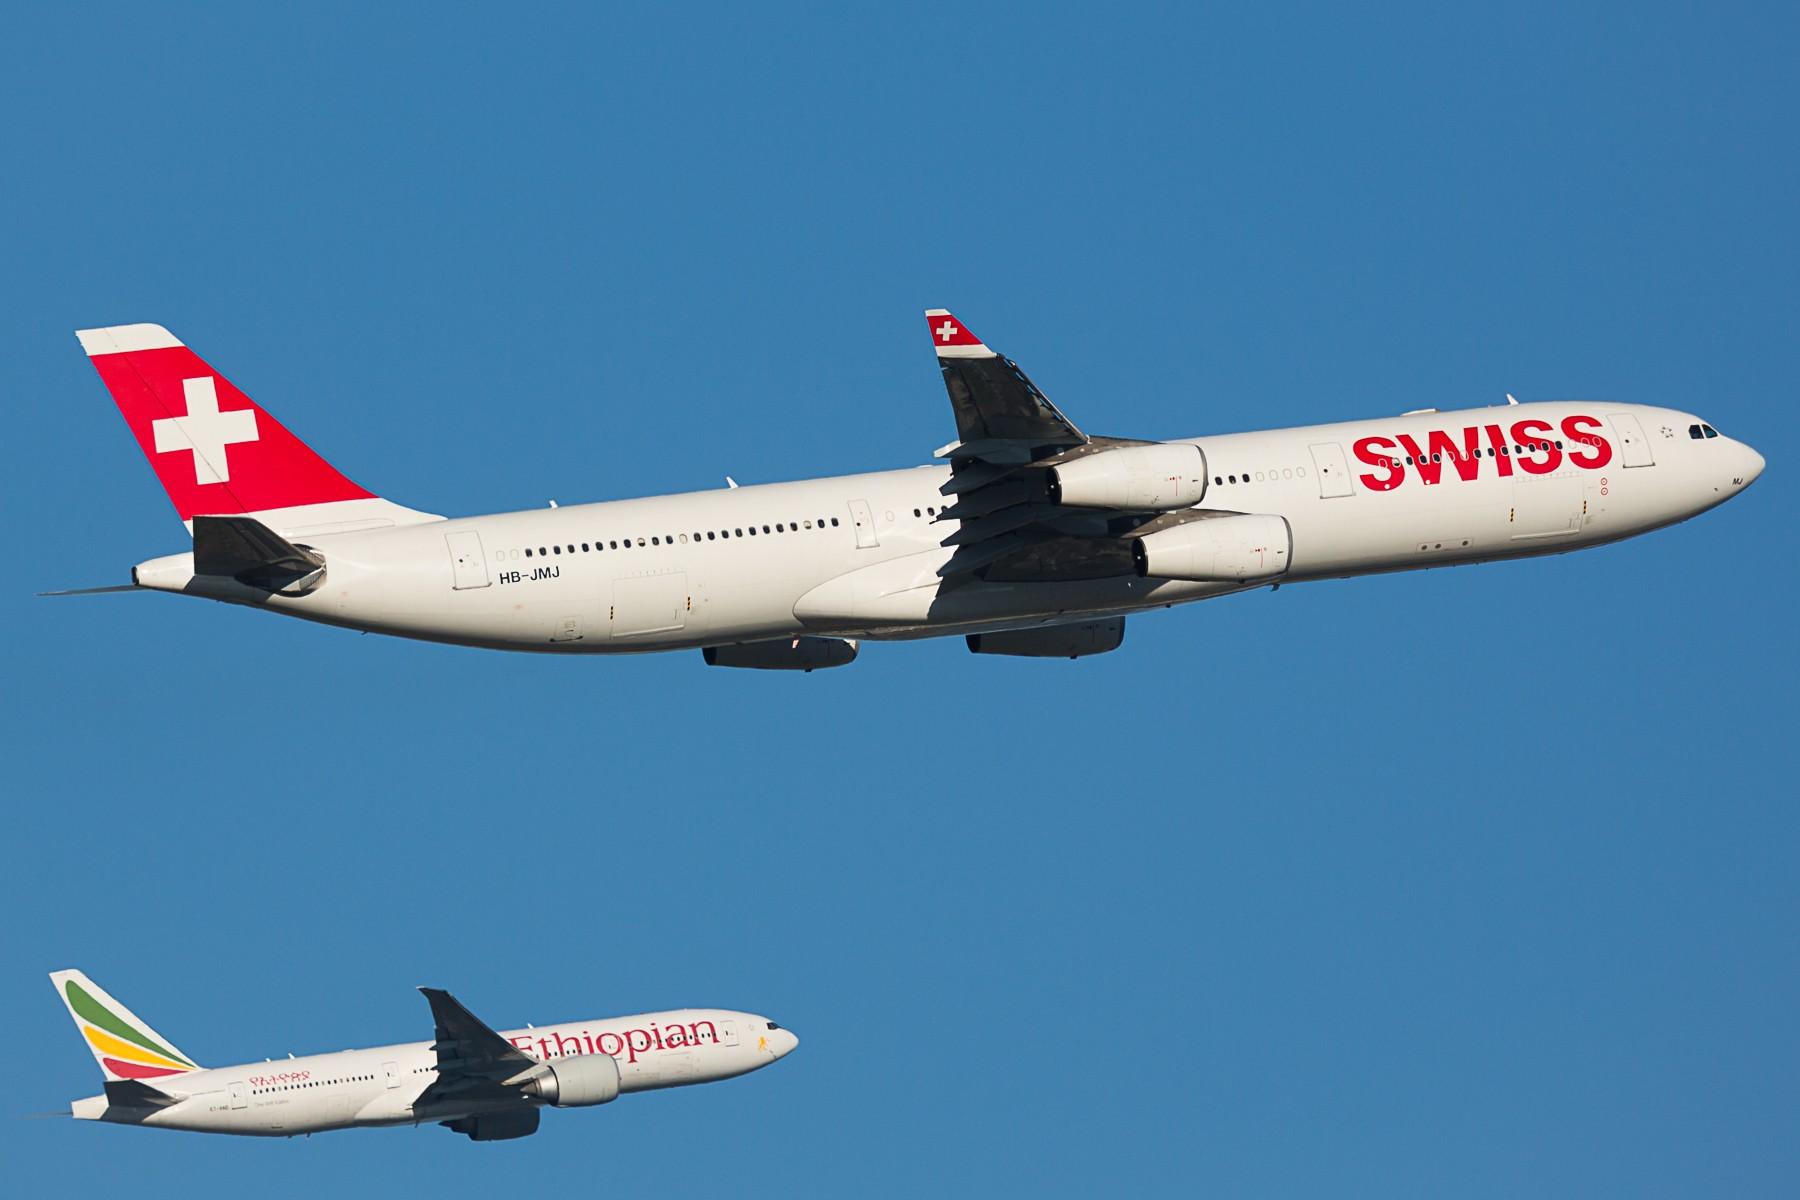 【PEK】准点的瑞士航空A343---晚点的埃塞俄比亚77B 双飞 AIRBUS A340-300 HB-JMJ 中国北京首都国际机场